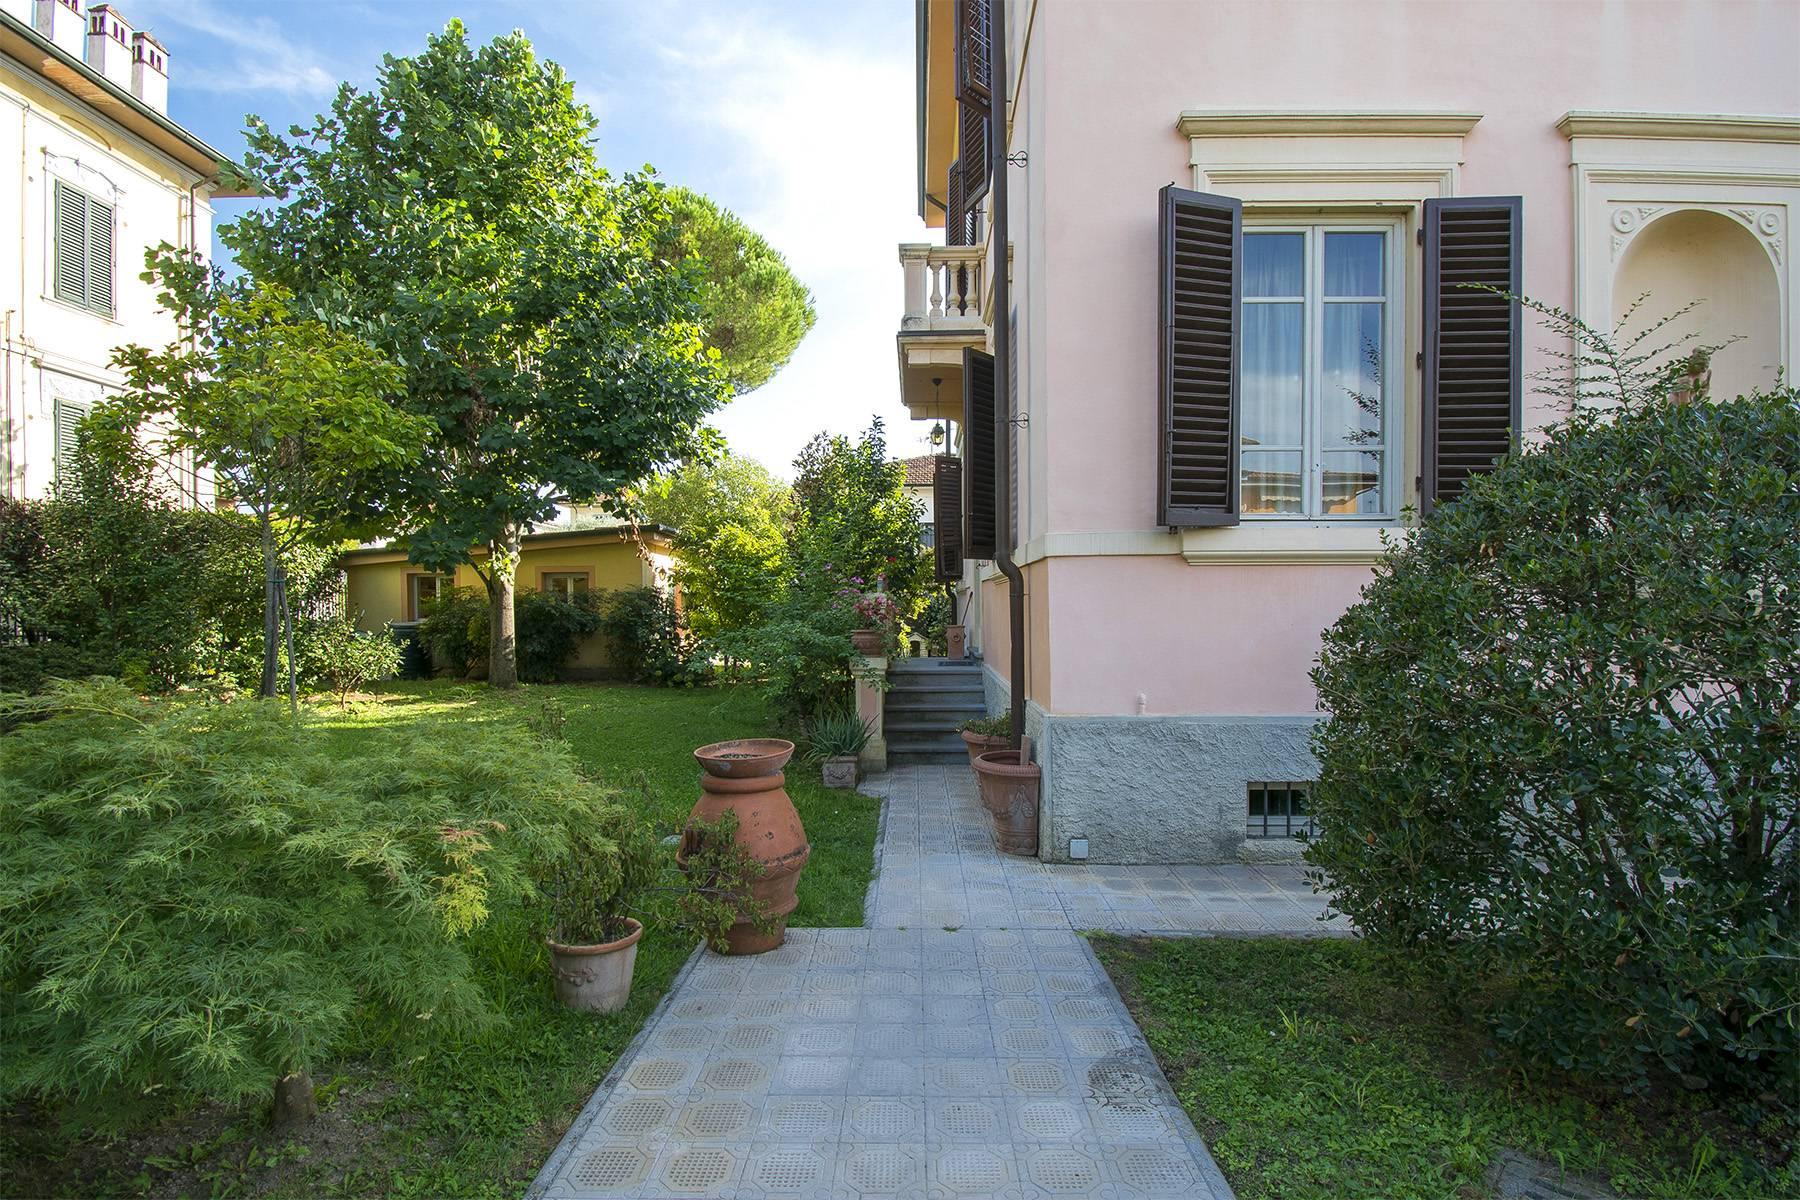 Villa in Vendita a Lucca: 5 locali, 350 mq - Foto 18